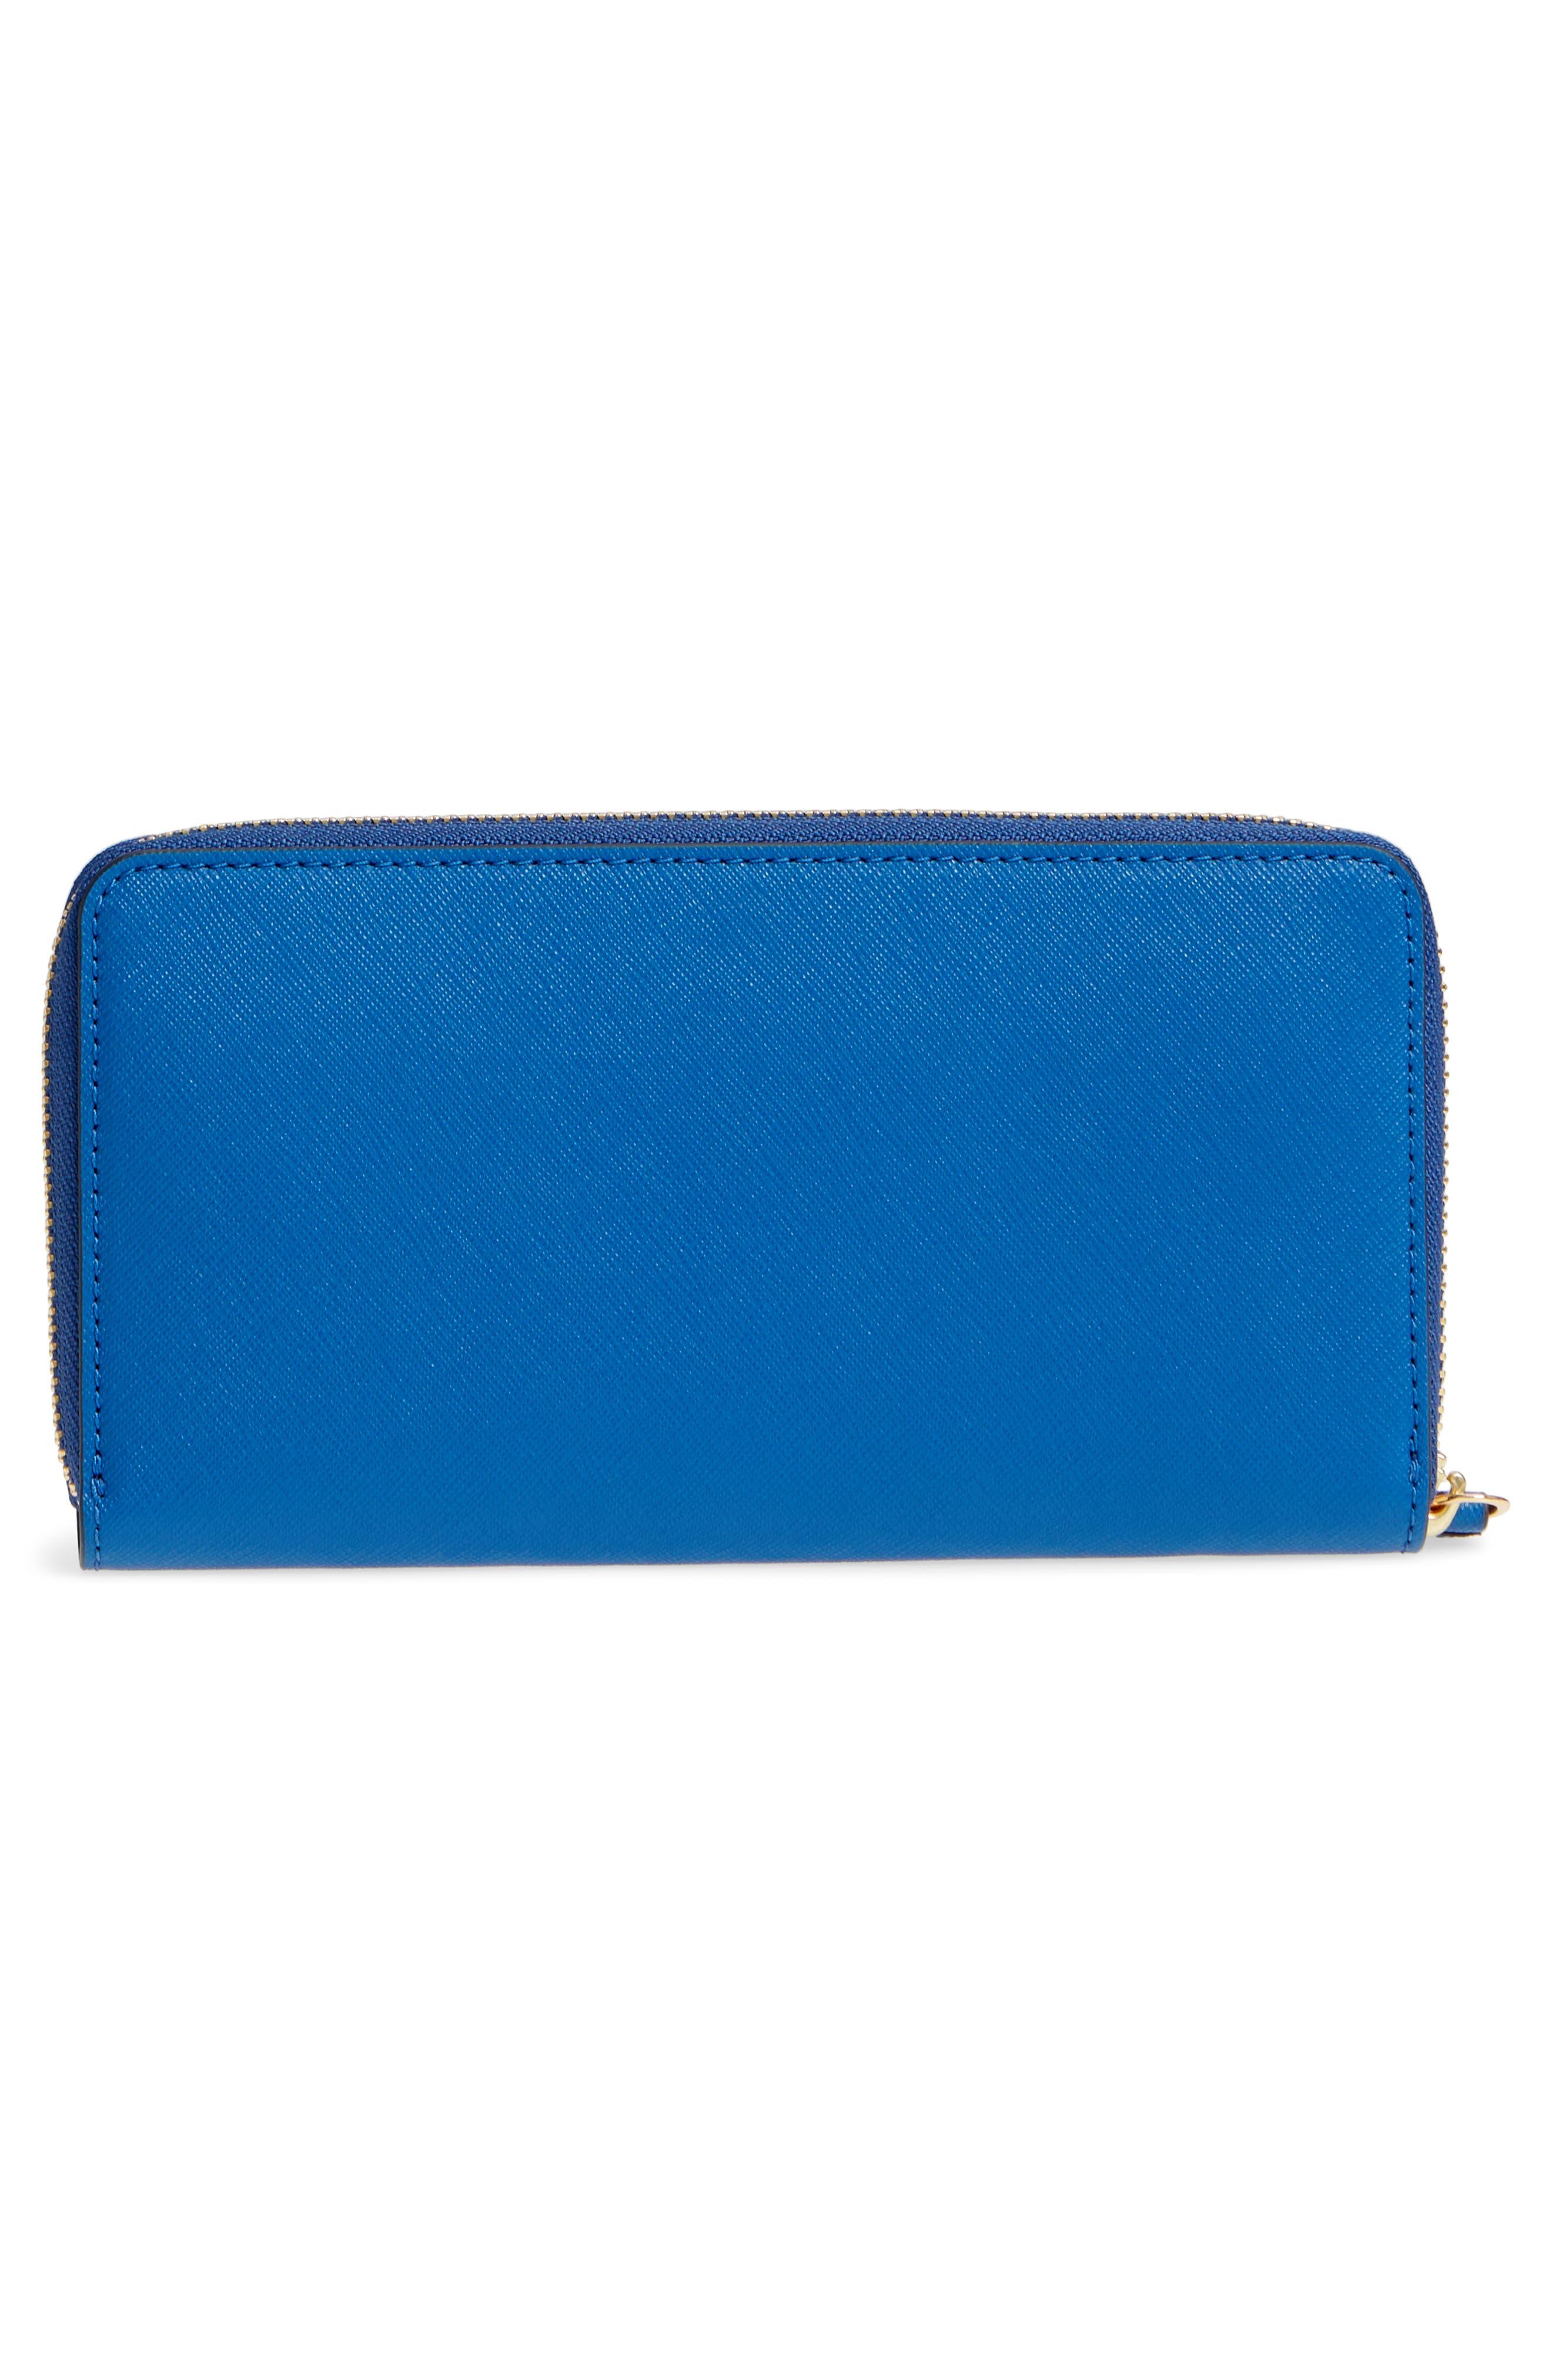 Robinson Zip Continental Wallet,                             Alternate thumbnail 4, color,                             Regal Blue / Royal Navy